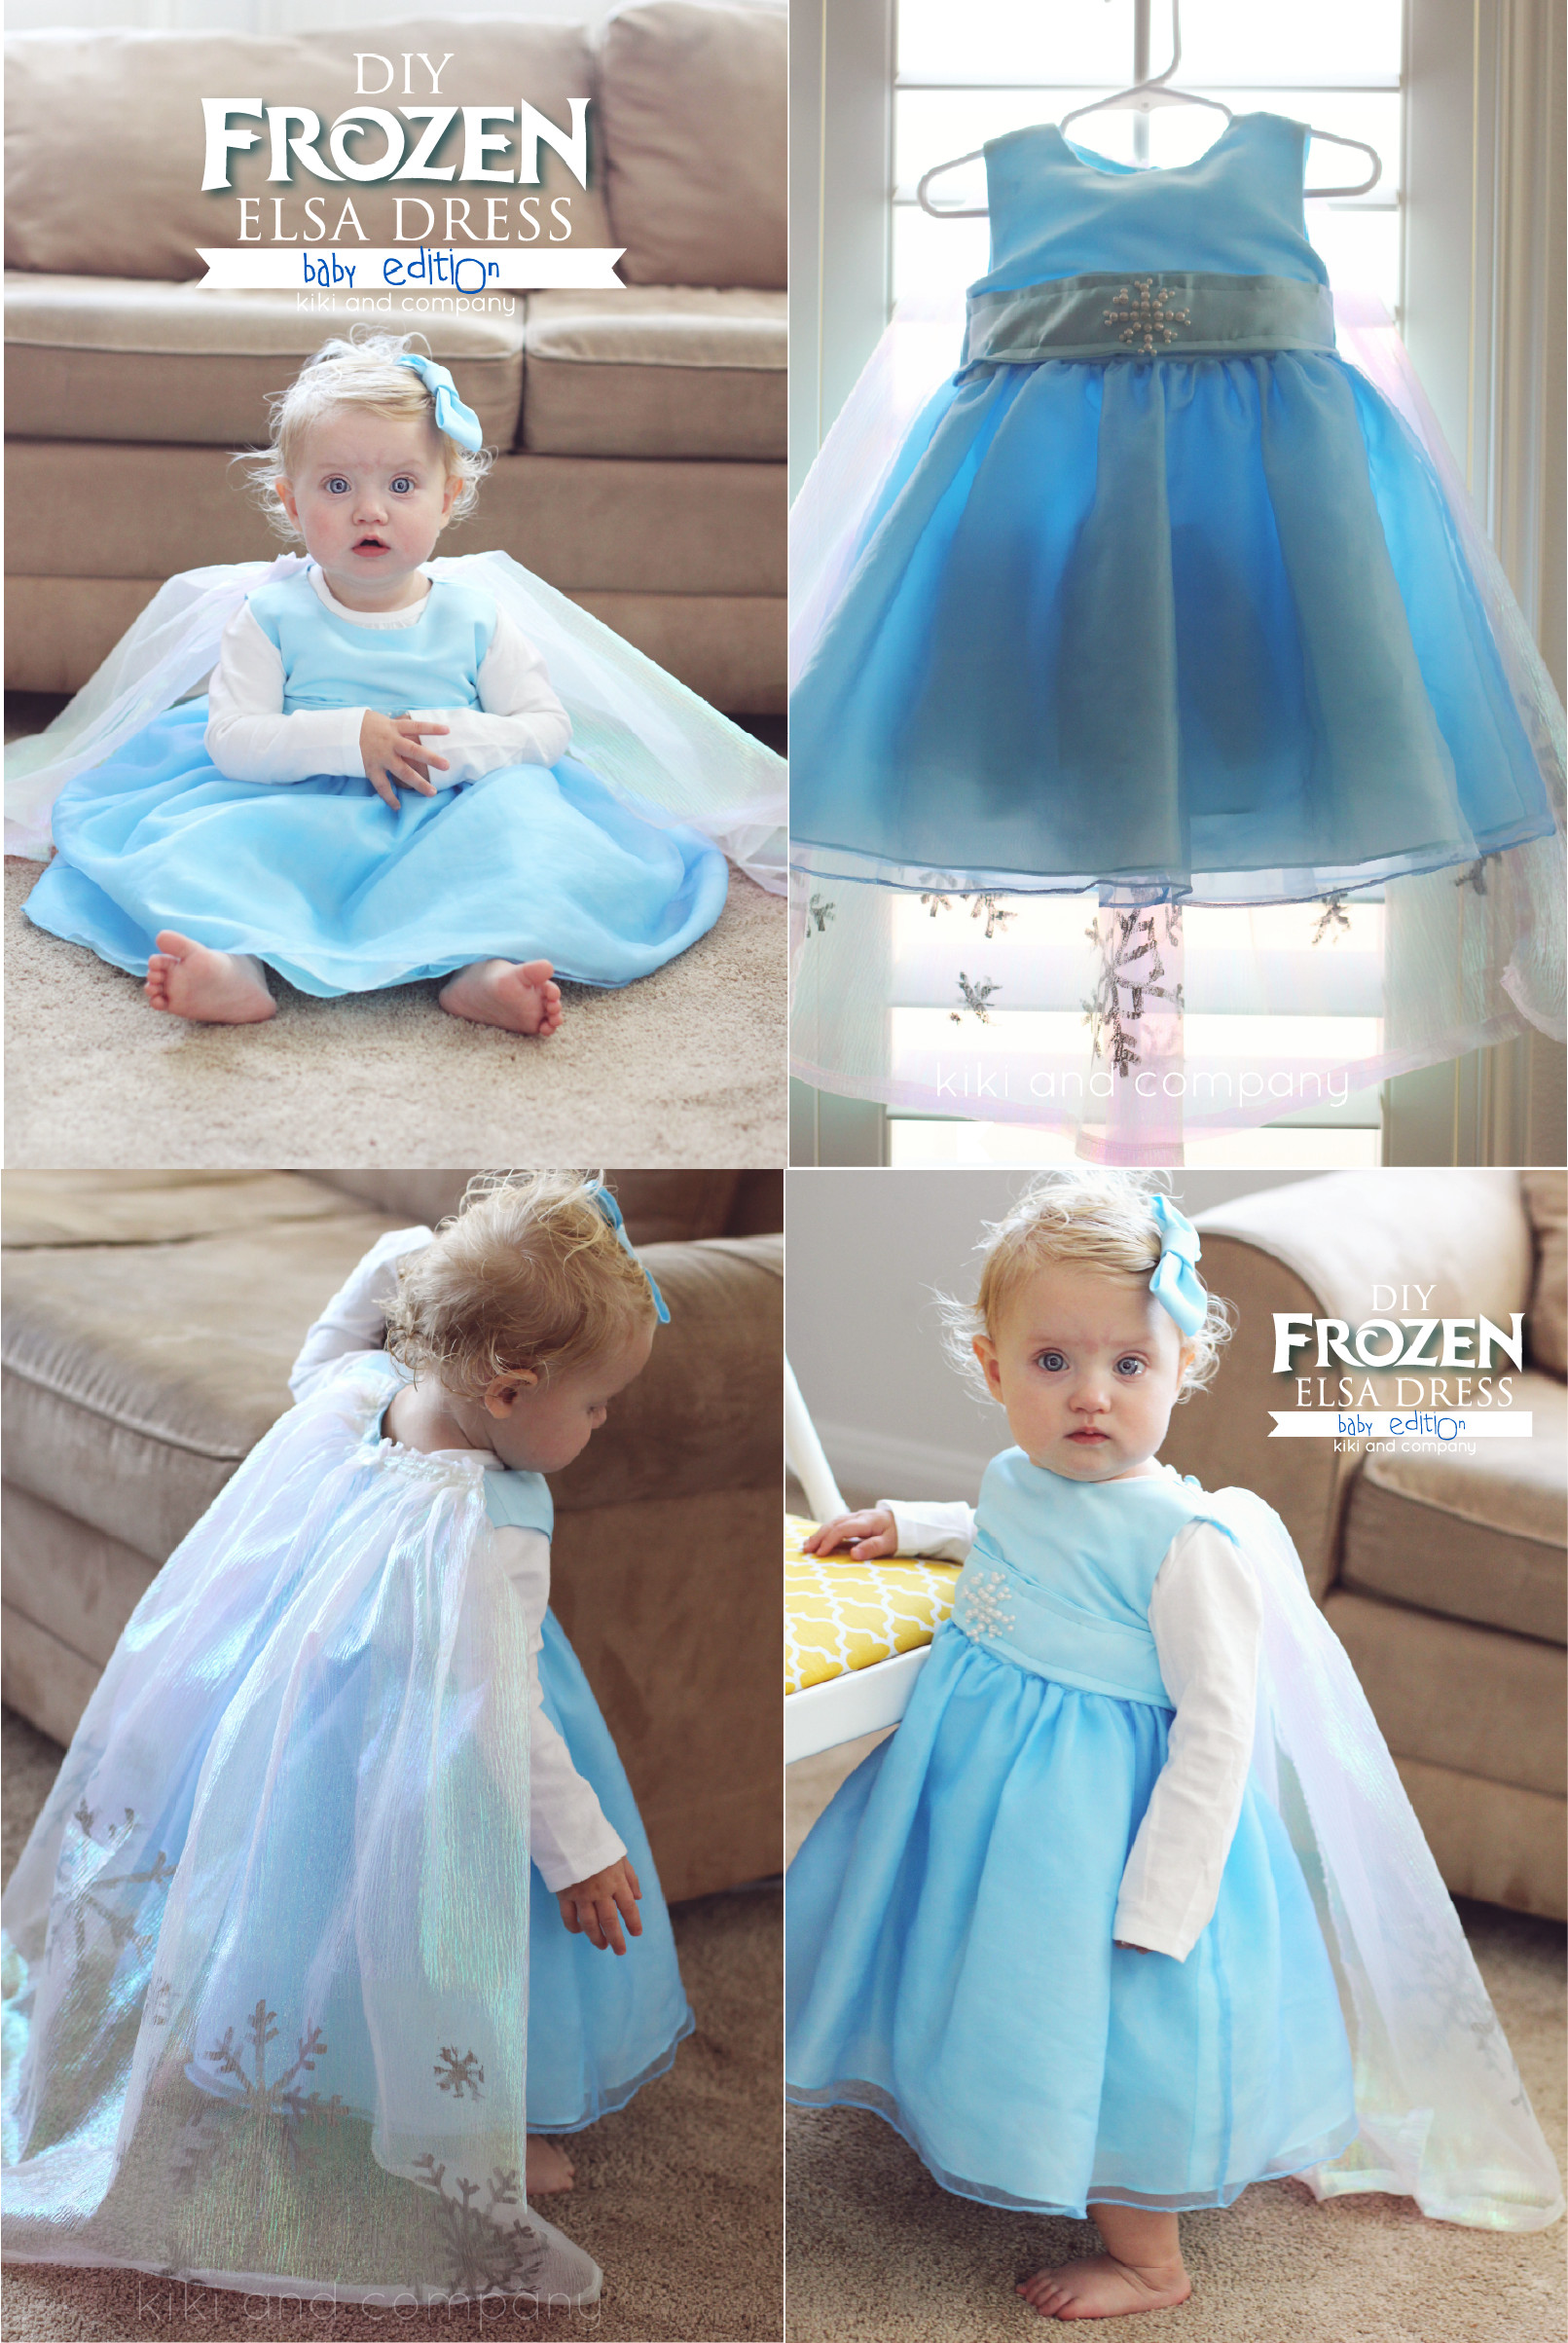 Diy Baby  DIY Frozen Elsa Dress BABY Edition free tutorial Kiki